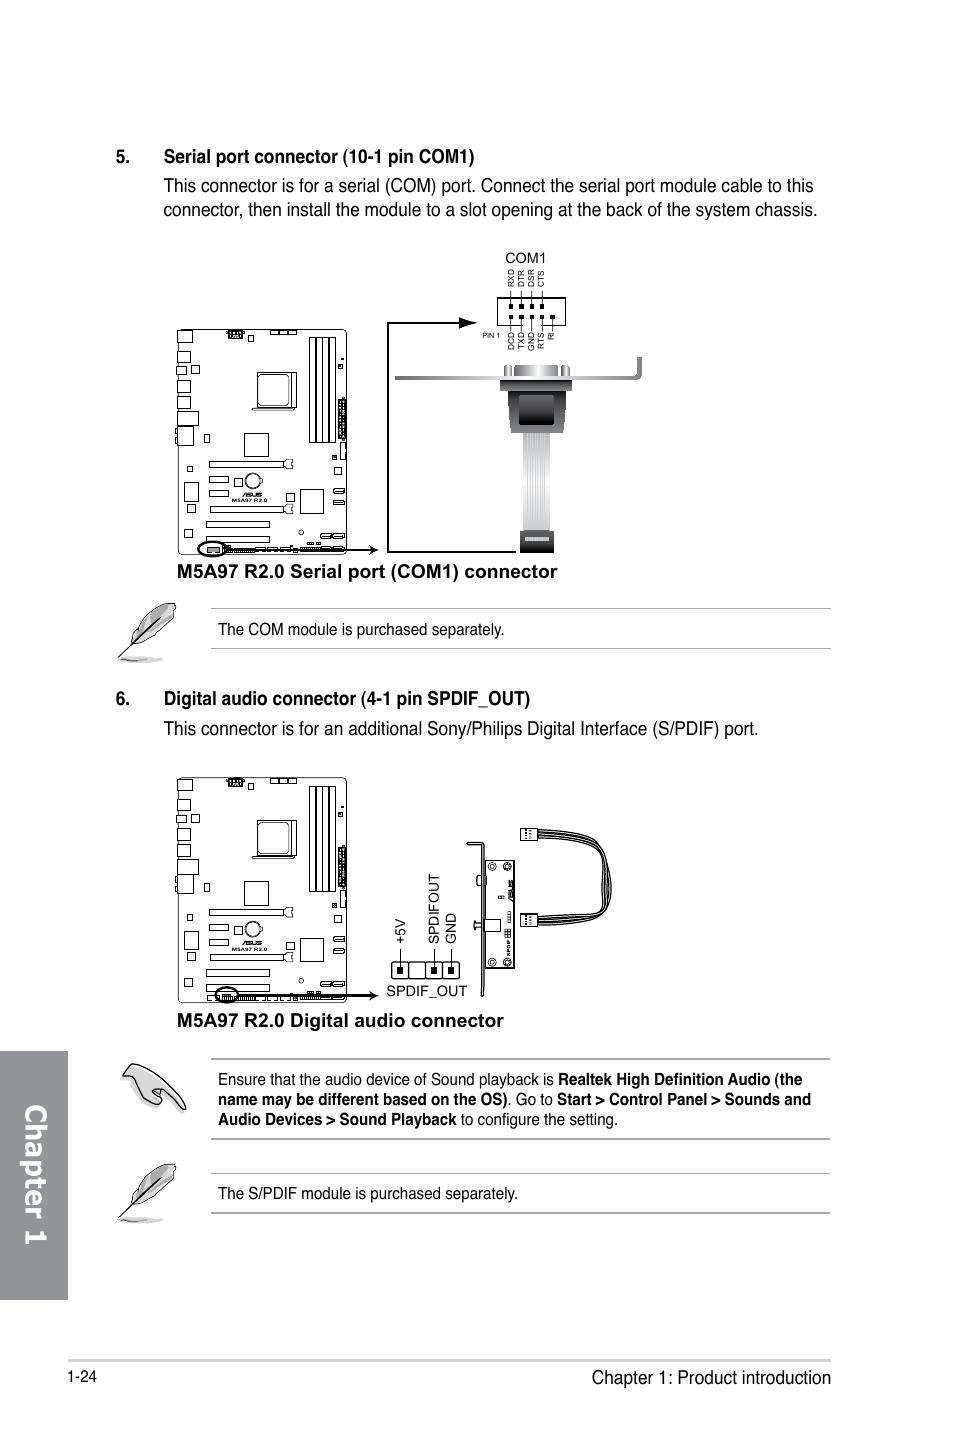 Asus M5a97 Manual Motherboard Wiring Diagram Schematics Diagrams